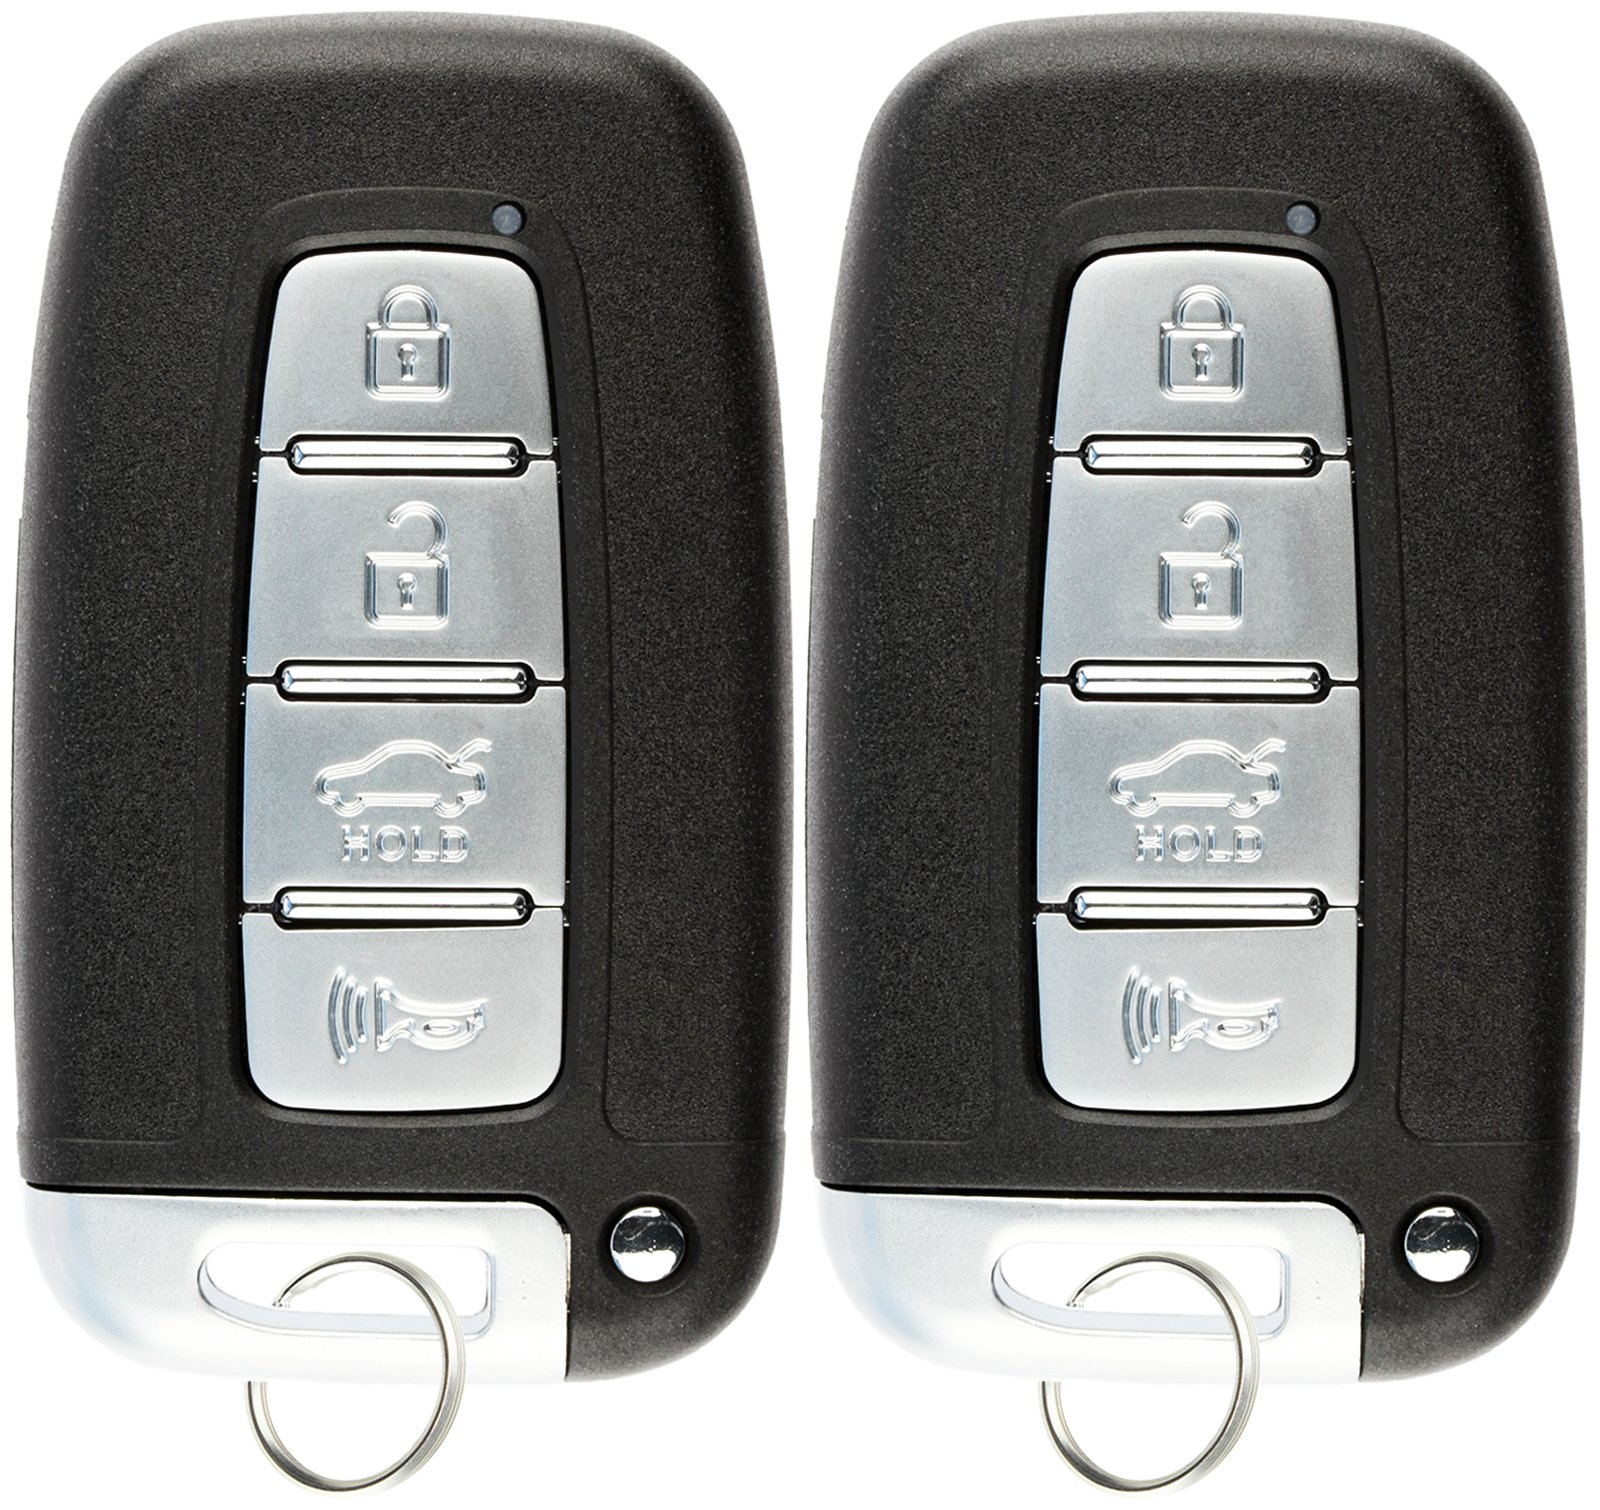 KeylessOption Keyless Entry Remote Control Car Key Fob Clicker for Hyundai Kia (Pack of 2)